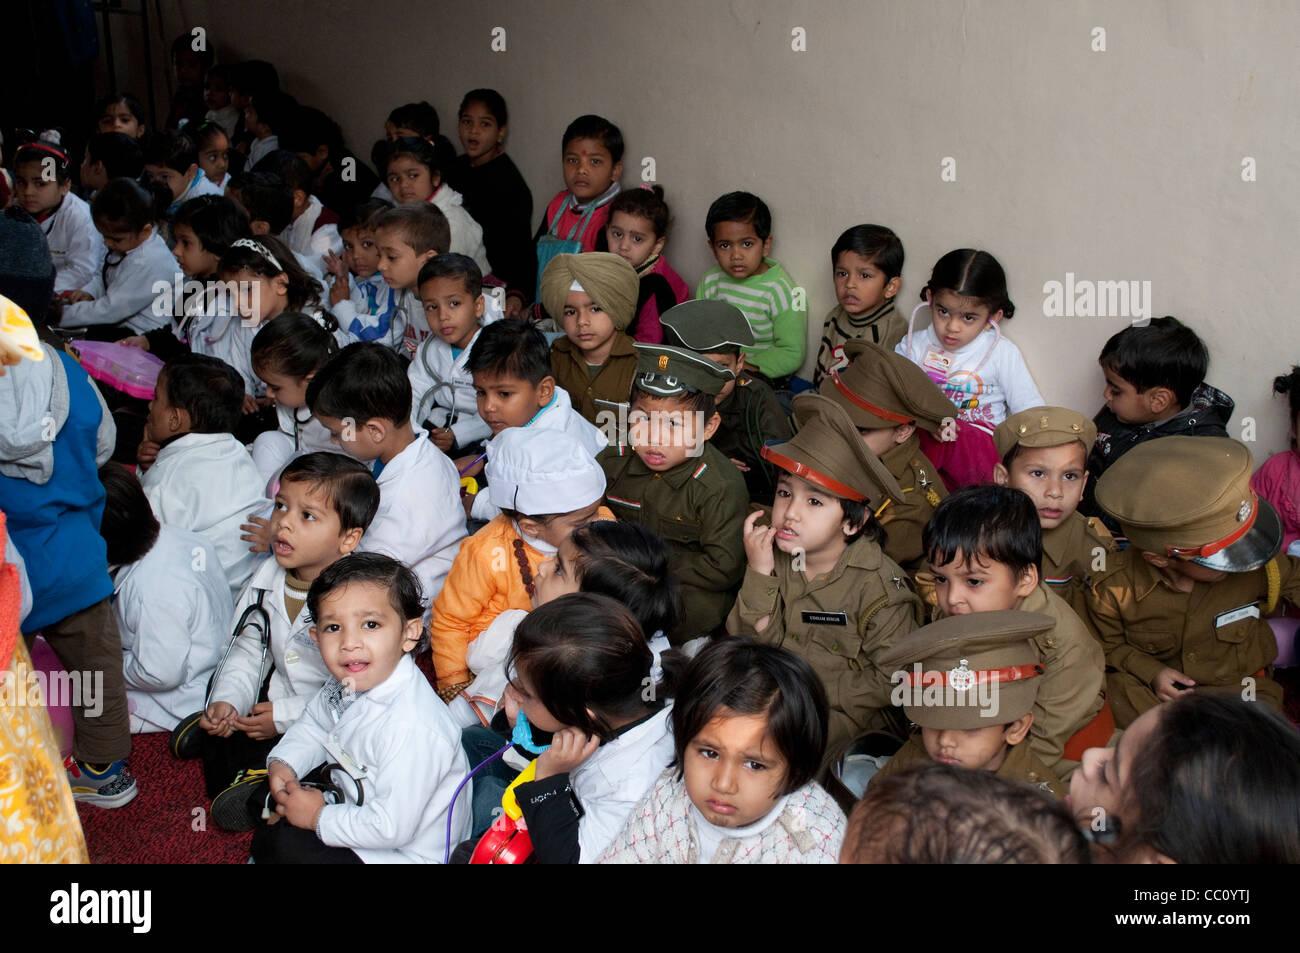 Kindergarten - Kinder verkleidet in verschiedenen berufen, Chandigarh, Indien Stockbild